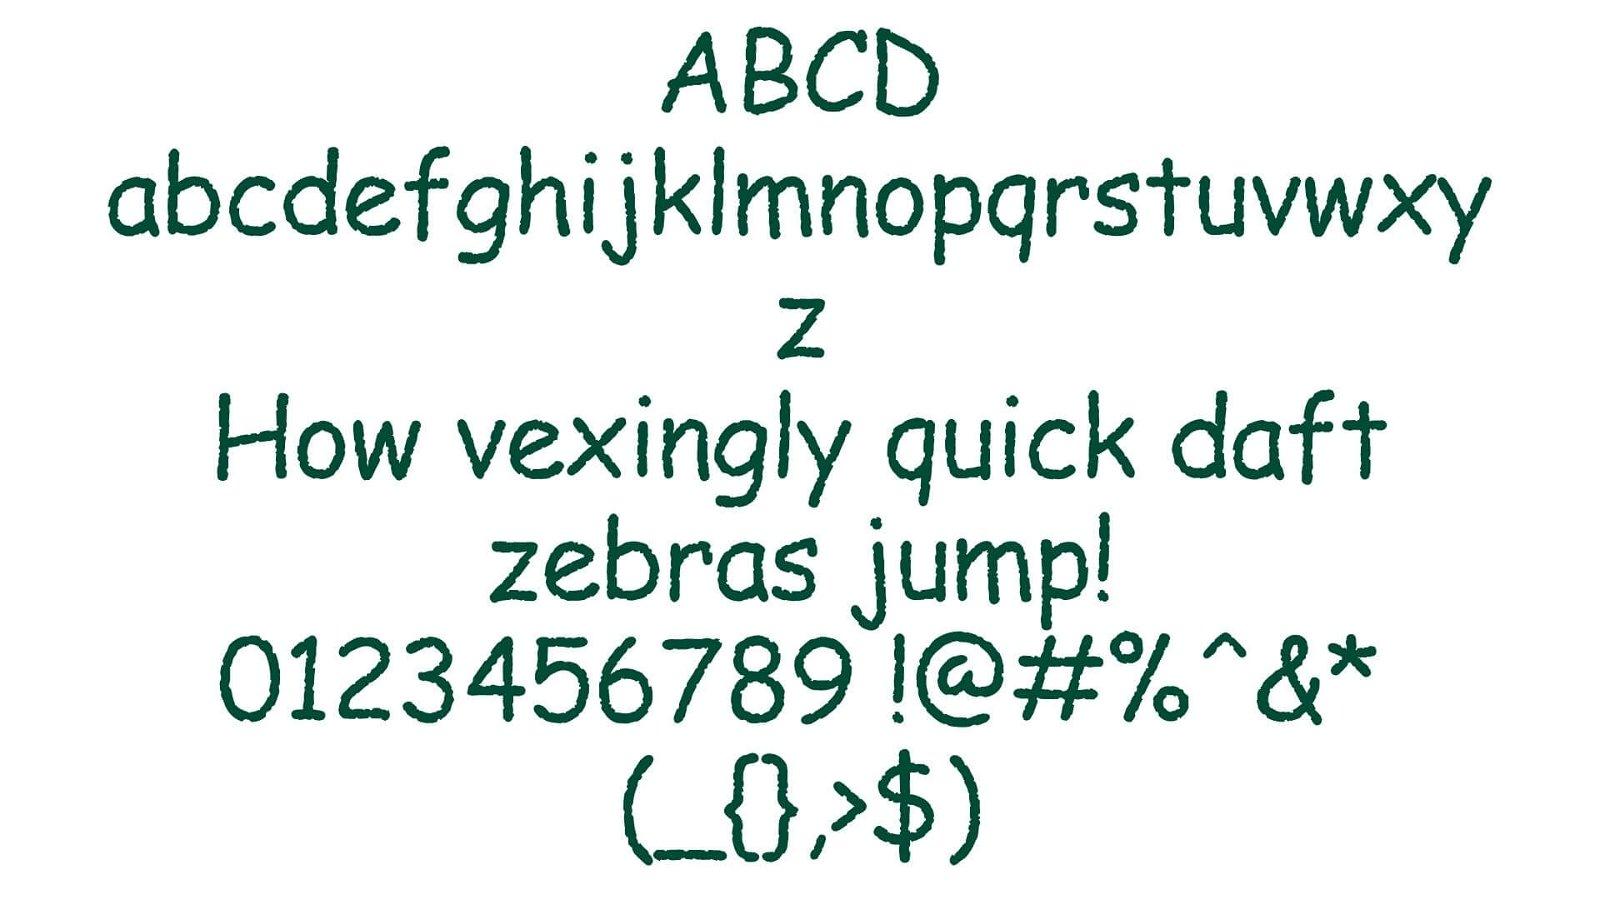 Comic Papyrus Font View - Comic Papyrus Font Free Download